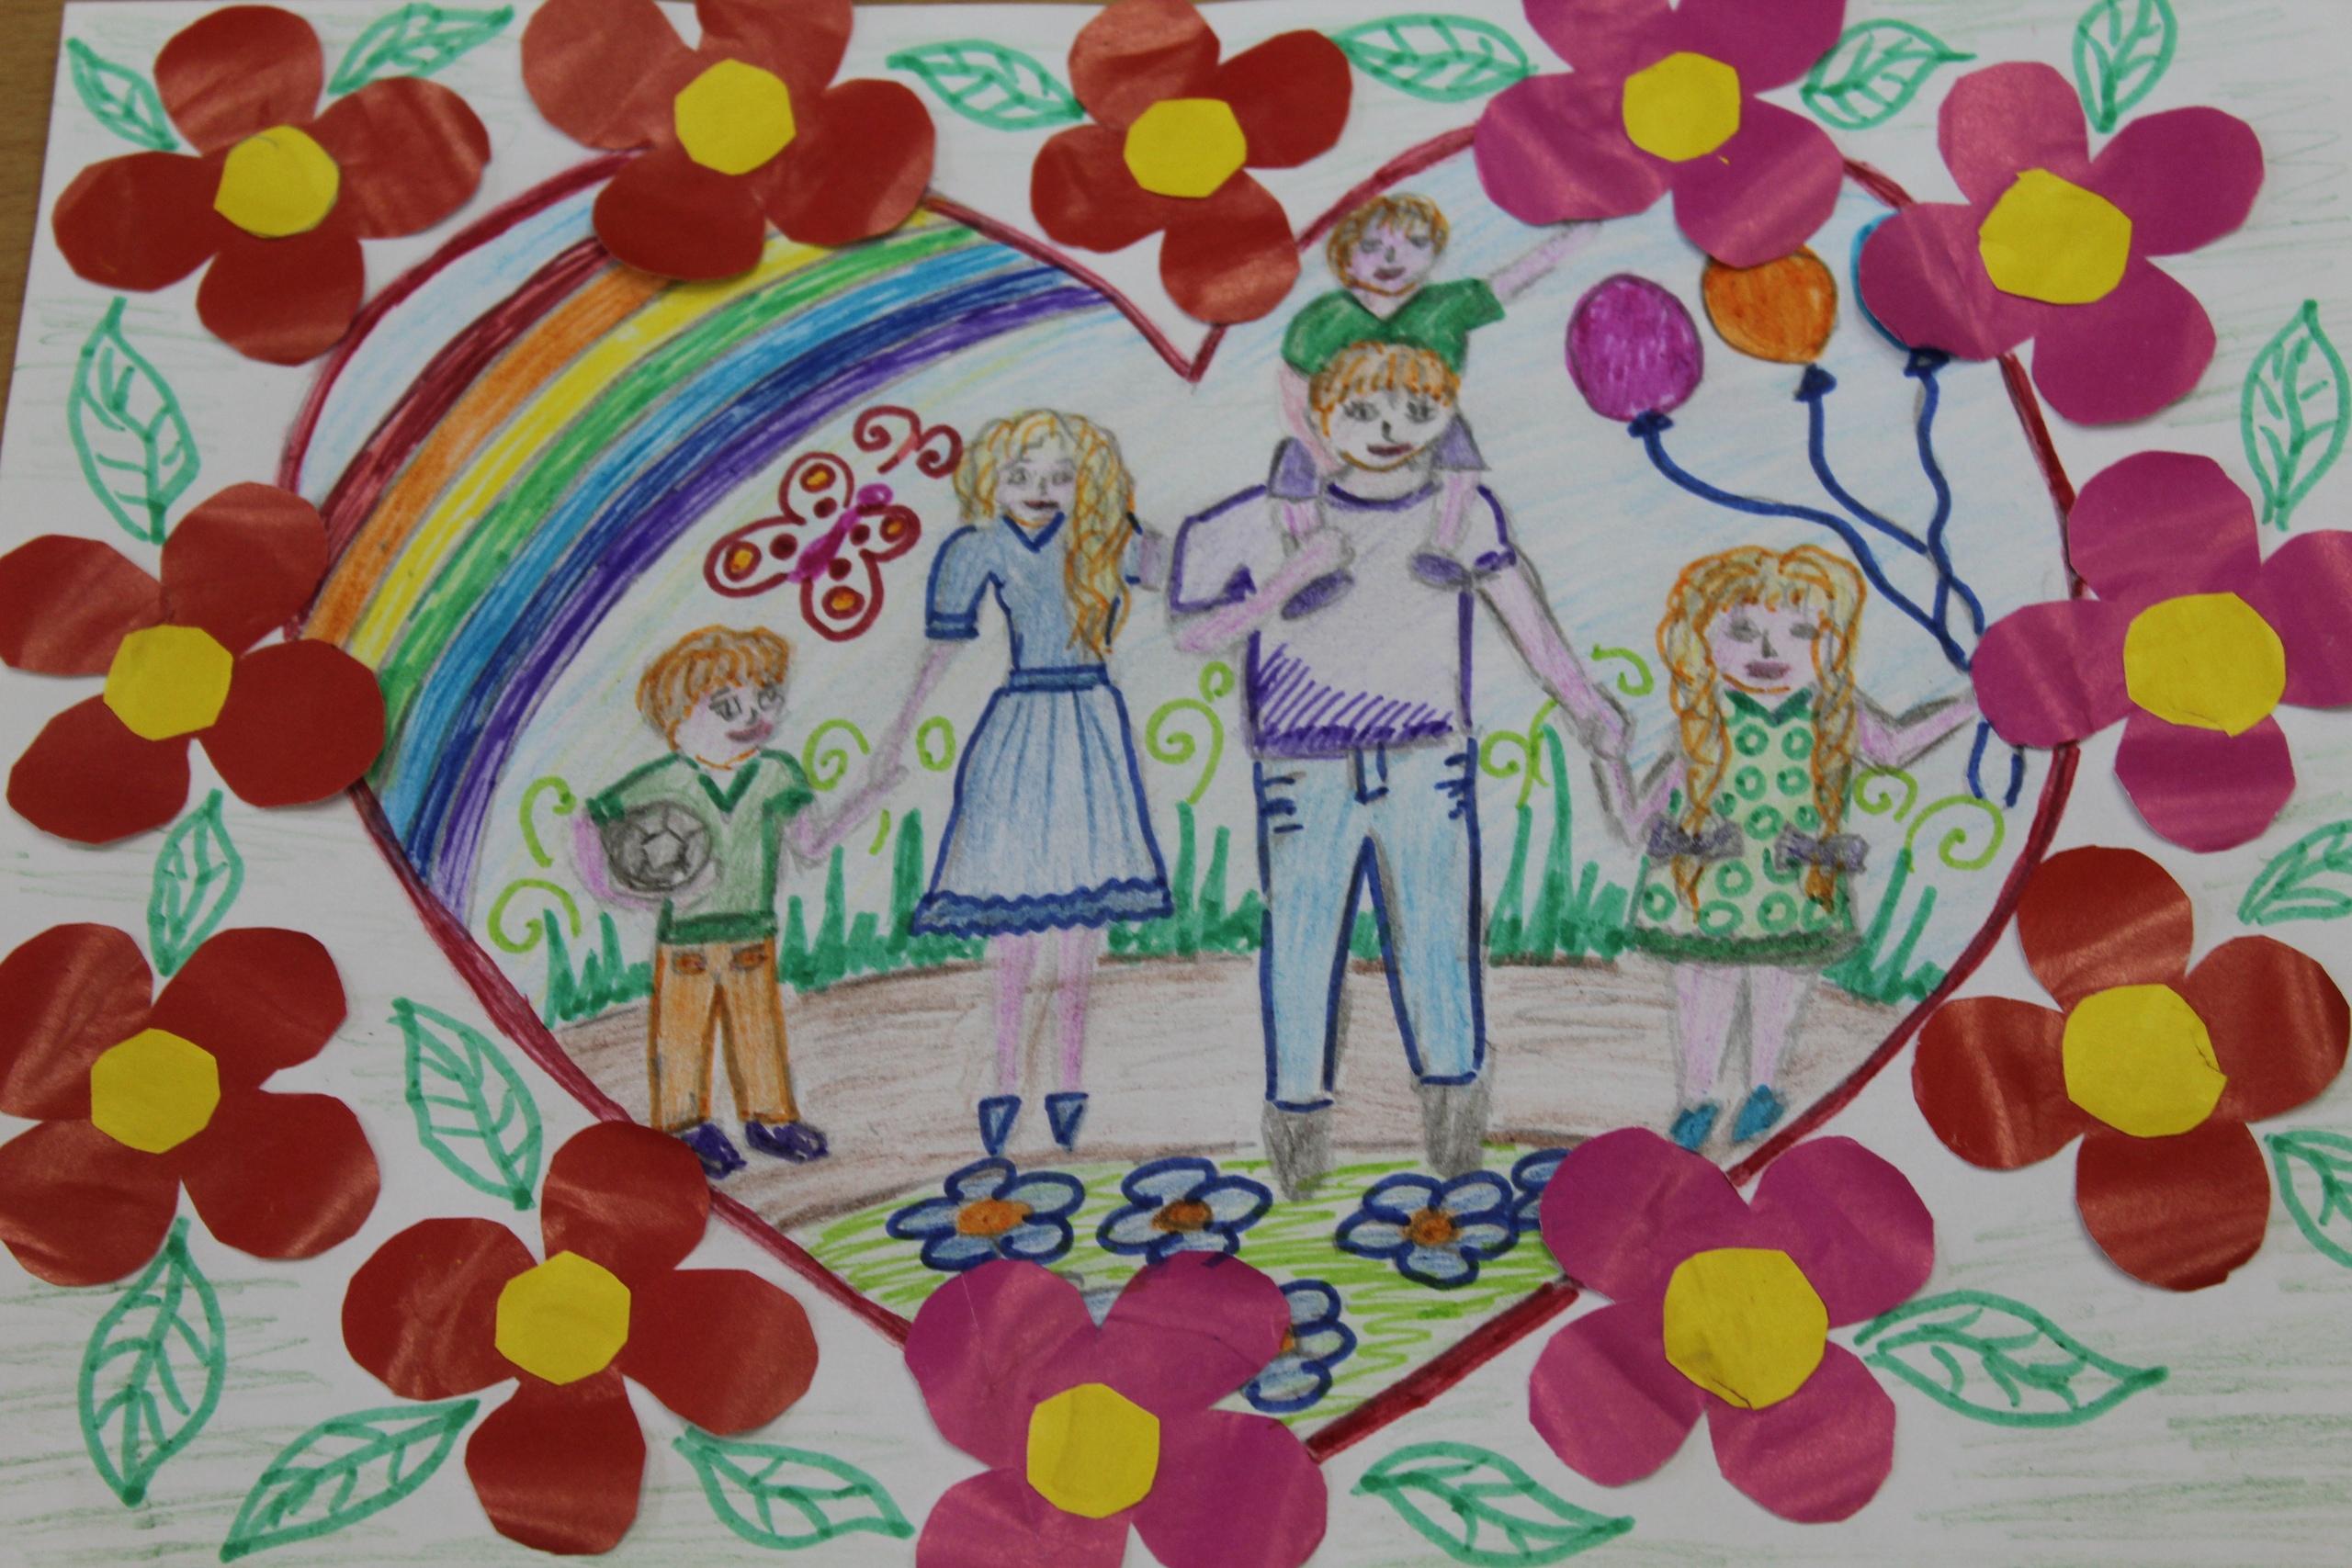 Ярославль | Конкурс рисунков «Моя семья» - БезФормата